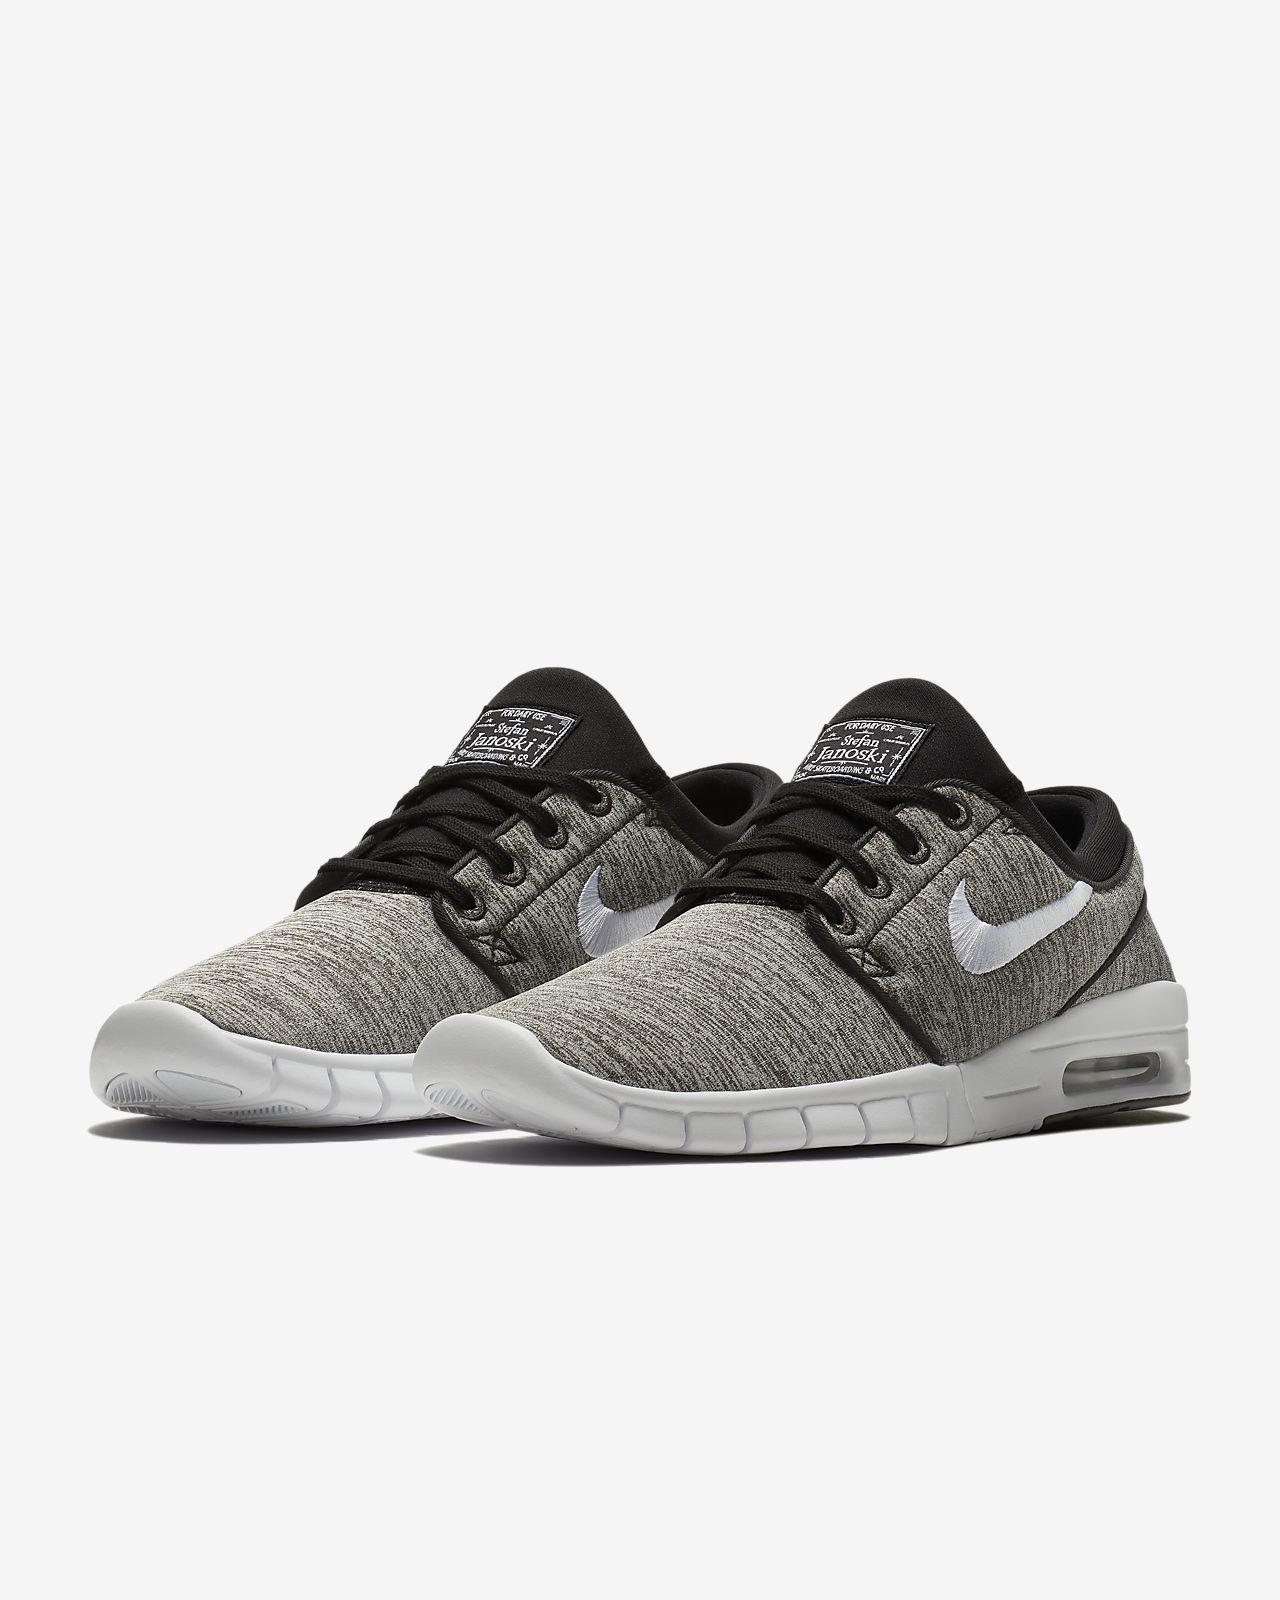 info for d164d c76c2 ... Nike SB Stefan Janoski Max Skate Shoe